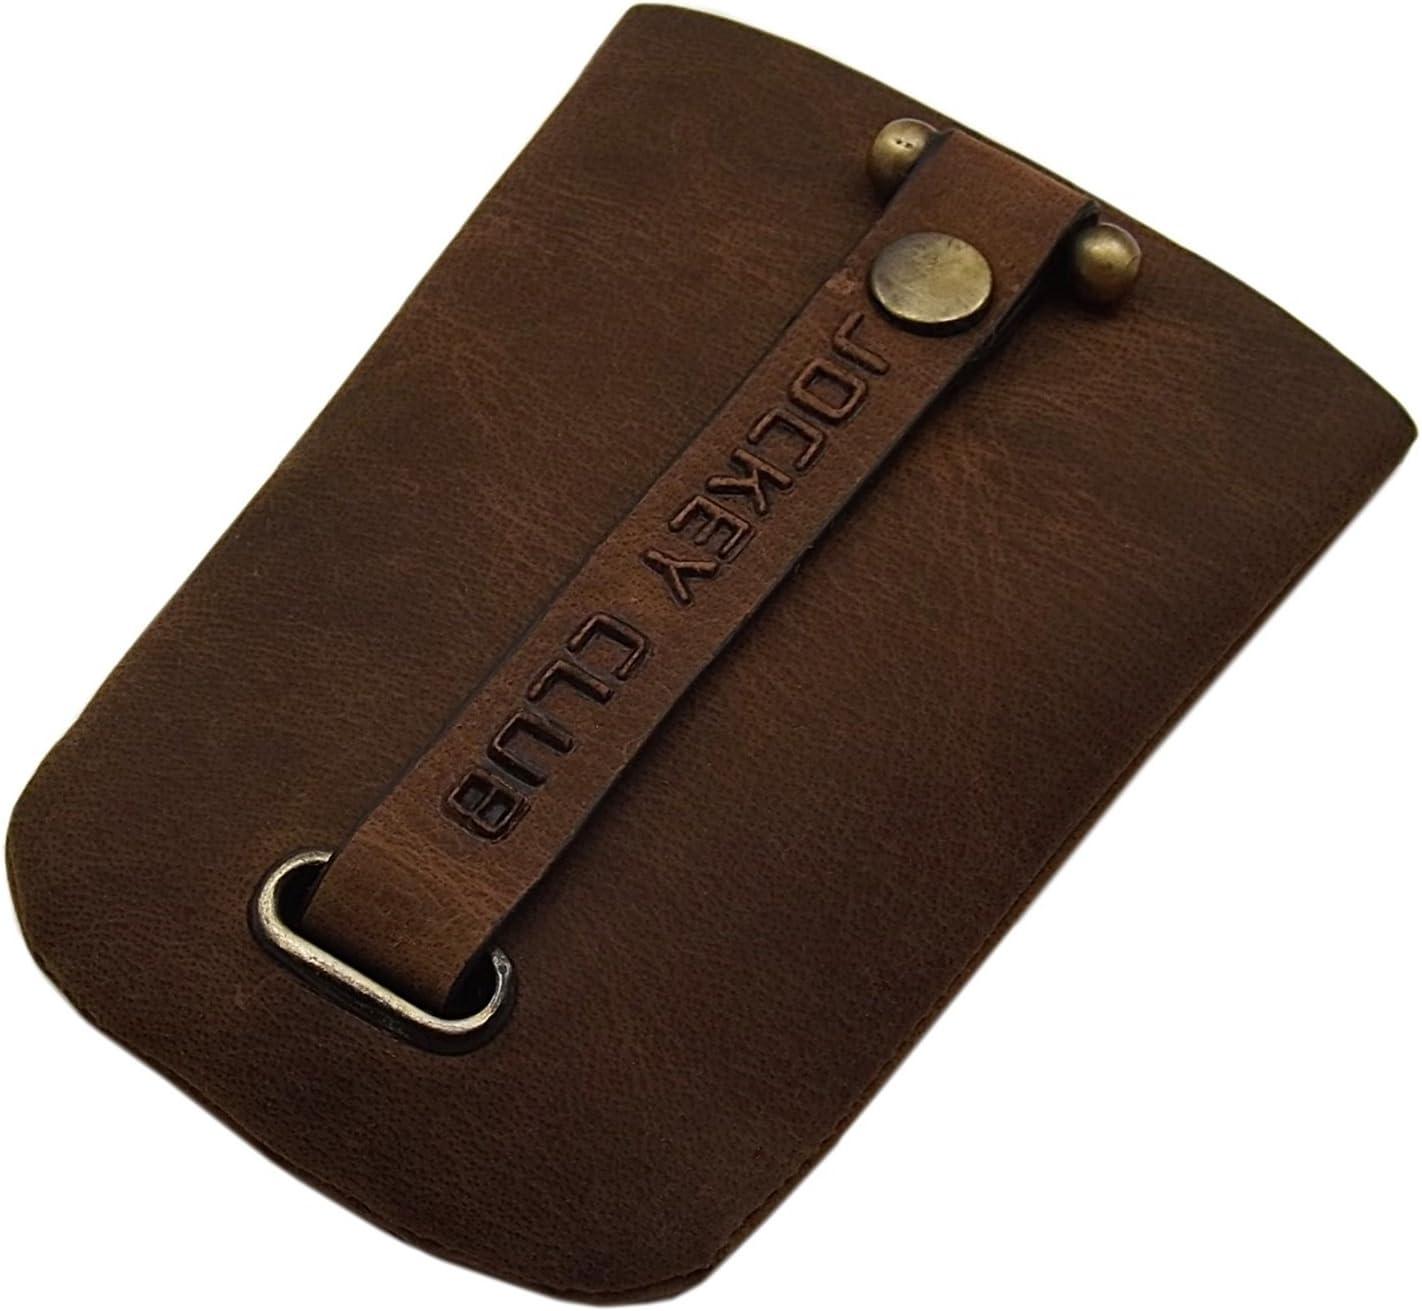 Cuero Estuches de Llave 1 Compartimento con un Llavero retráctil en marrón o coñac (Coñac)